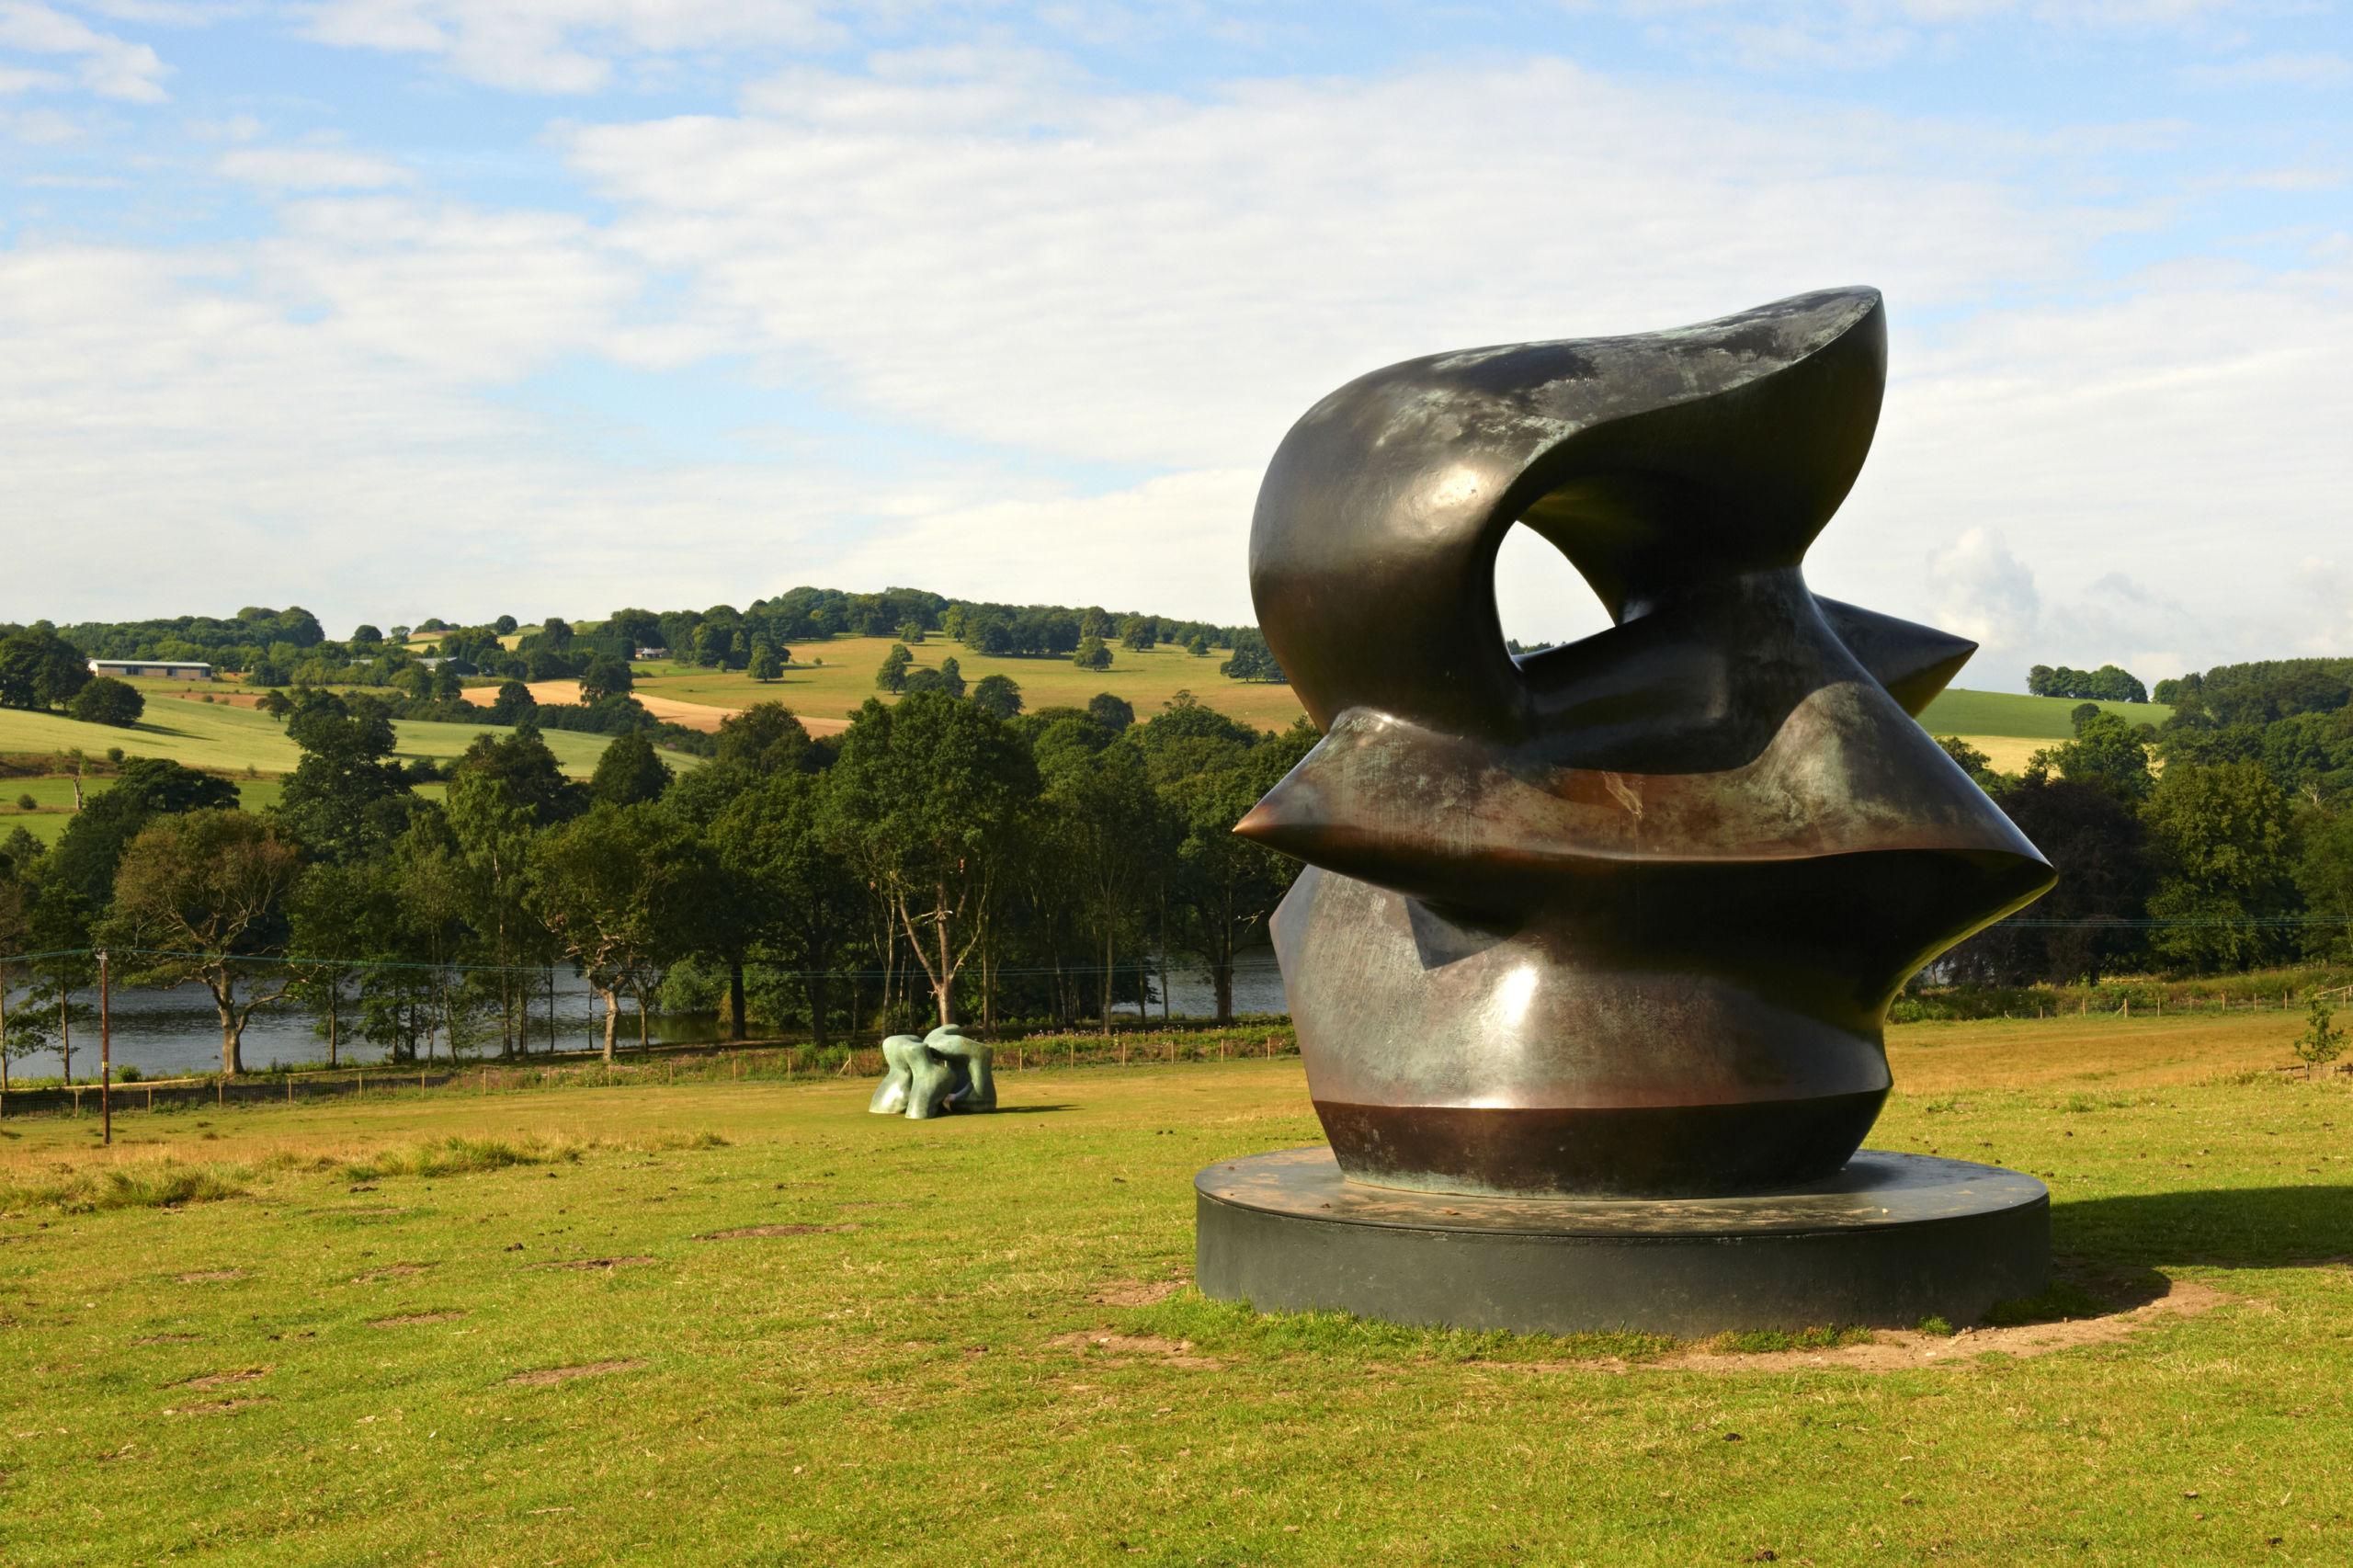 Bronze sculpture overlooking the countryside